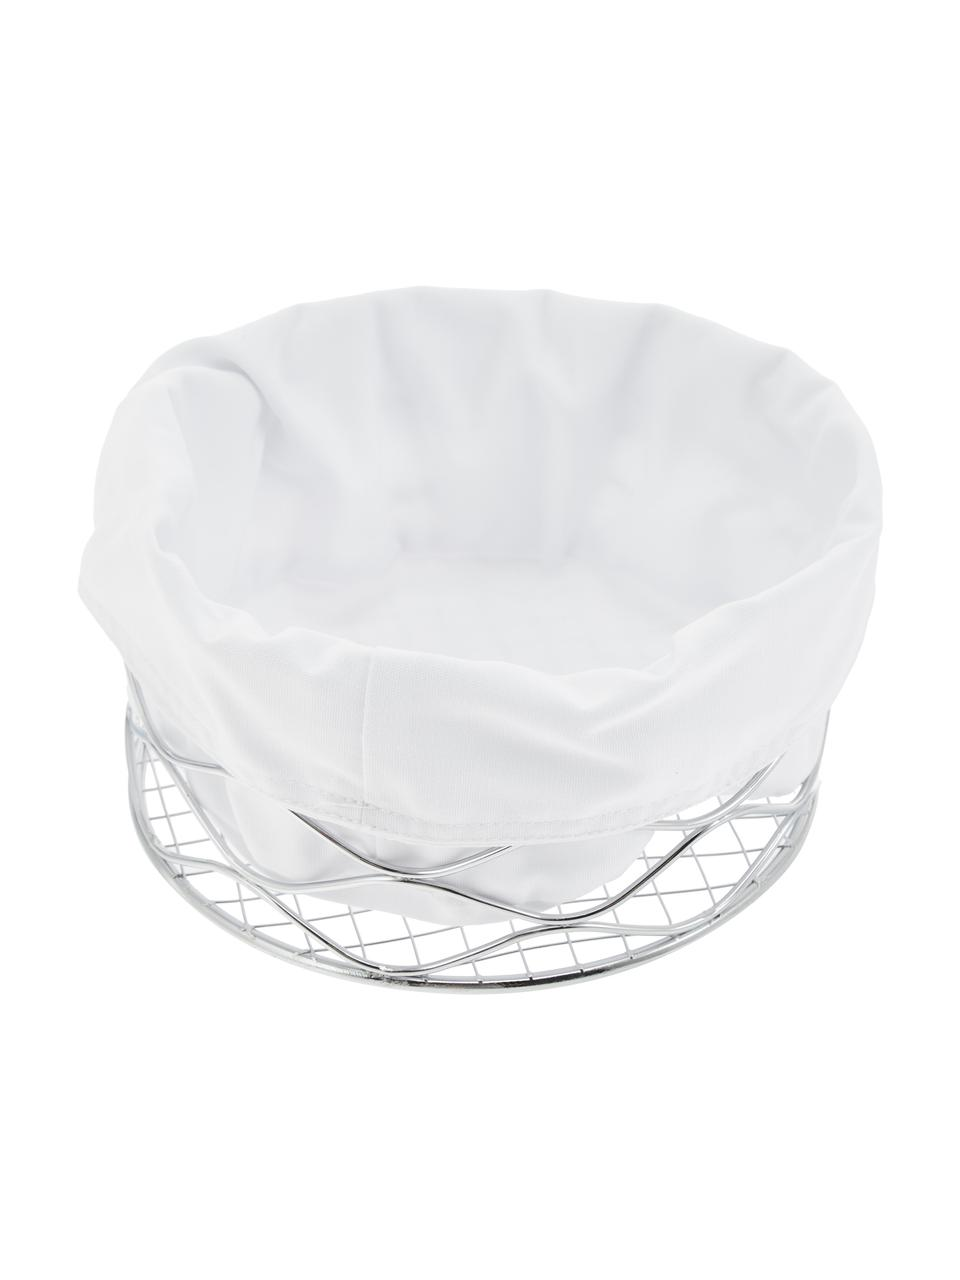 Brotkorb Alana mit herausnehmbarem Beutel, Brotkorb: Metall, verchromt, Beutel: 100% Baumwolle, Chrom, Weiß, Ø 21 x 11 cm